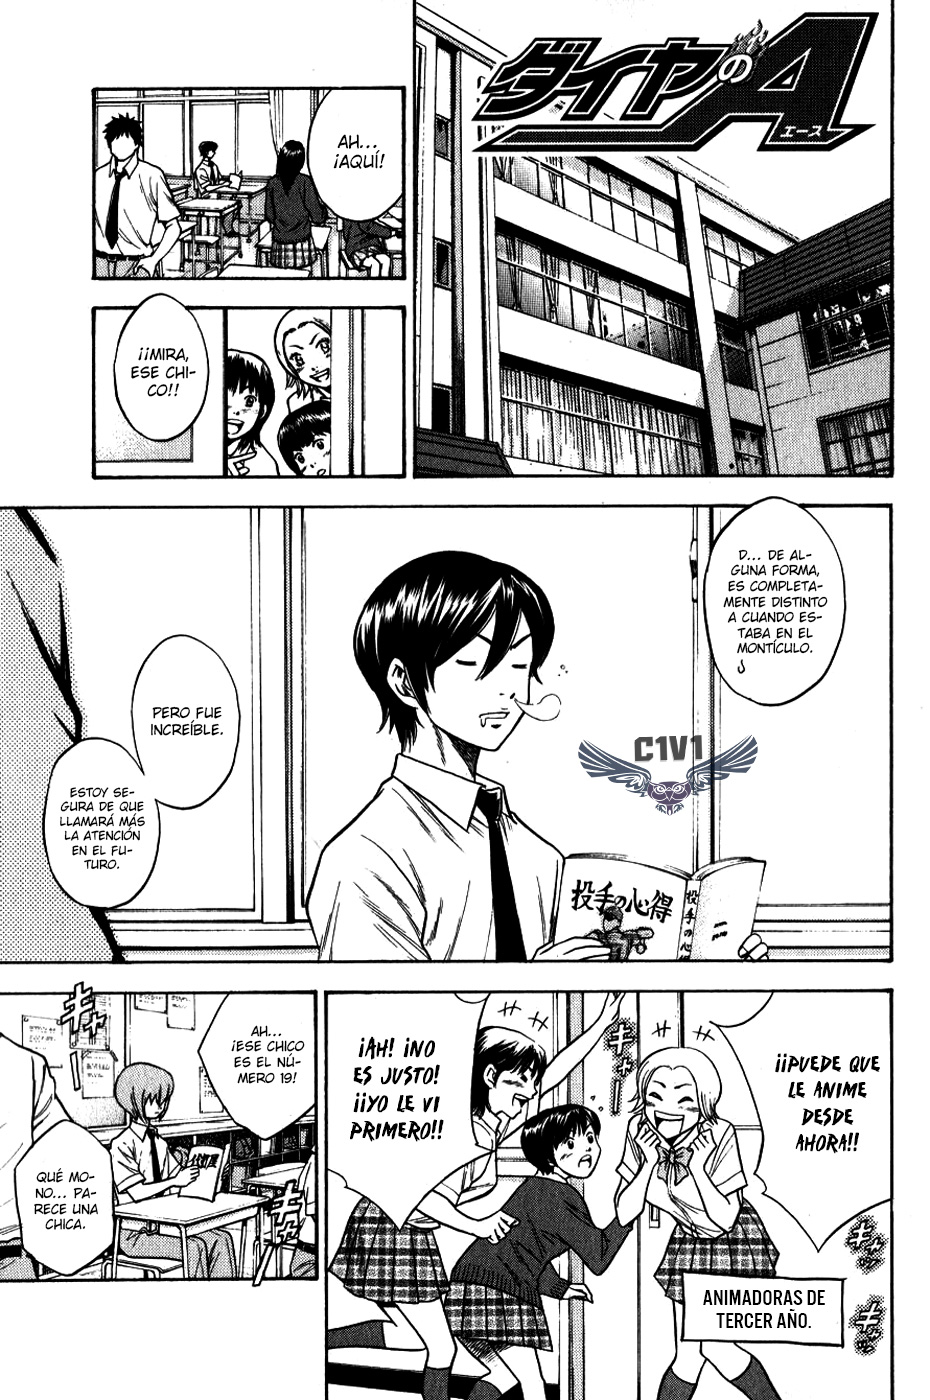 http://c5.ninemanga.com/es_manga/24/1752/389522/be7f9ca66f2fb4e760fb991d89d74002.jpg Page 2